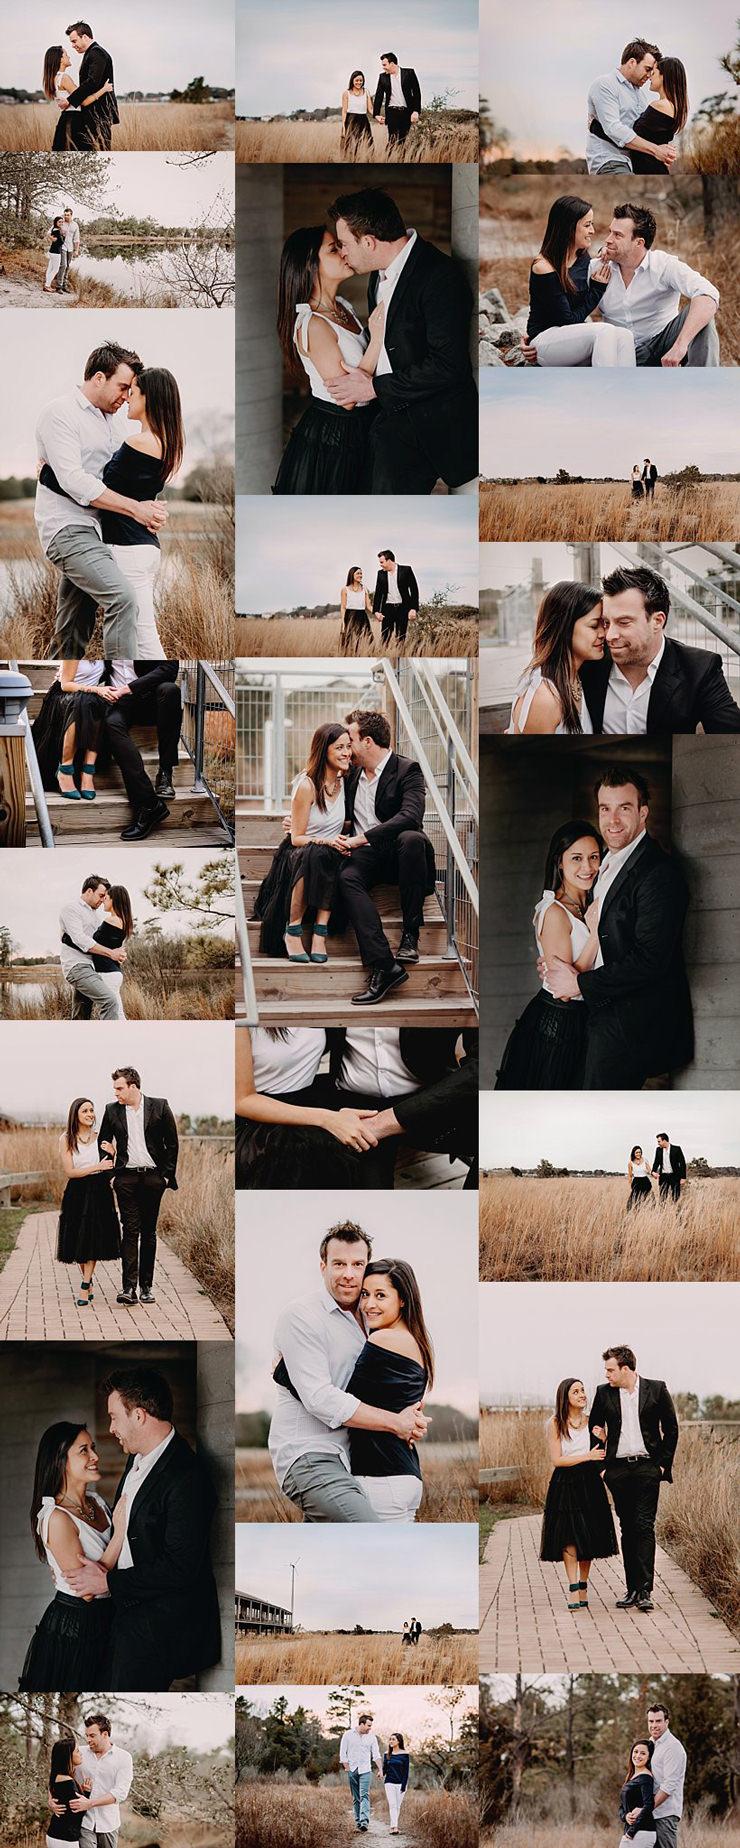 inspiration-for-outdoor-engagement-photos-virginia-beach-photographer-melissa-bliss-photography-VA-wedding-photographer-.jpg